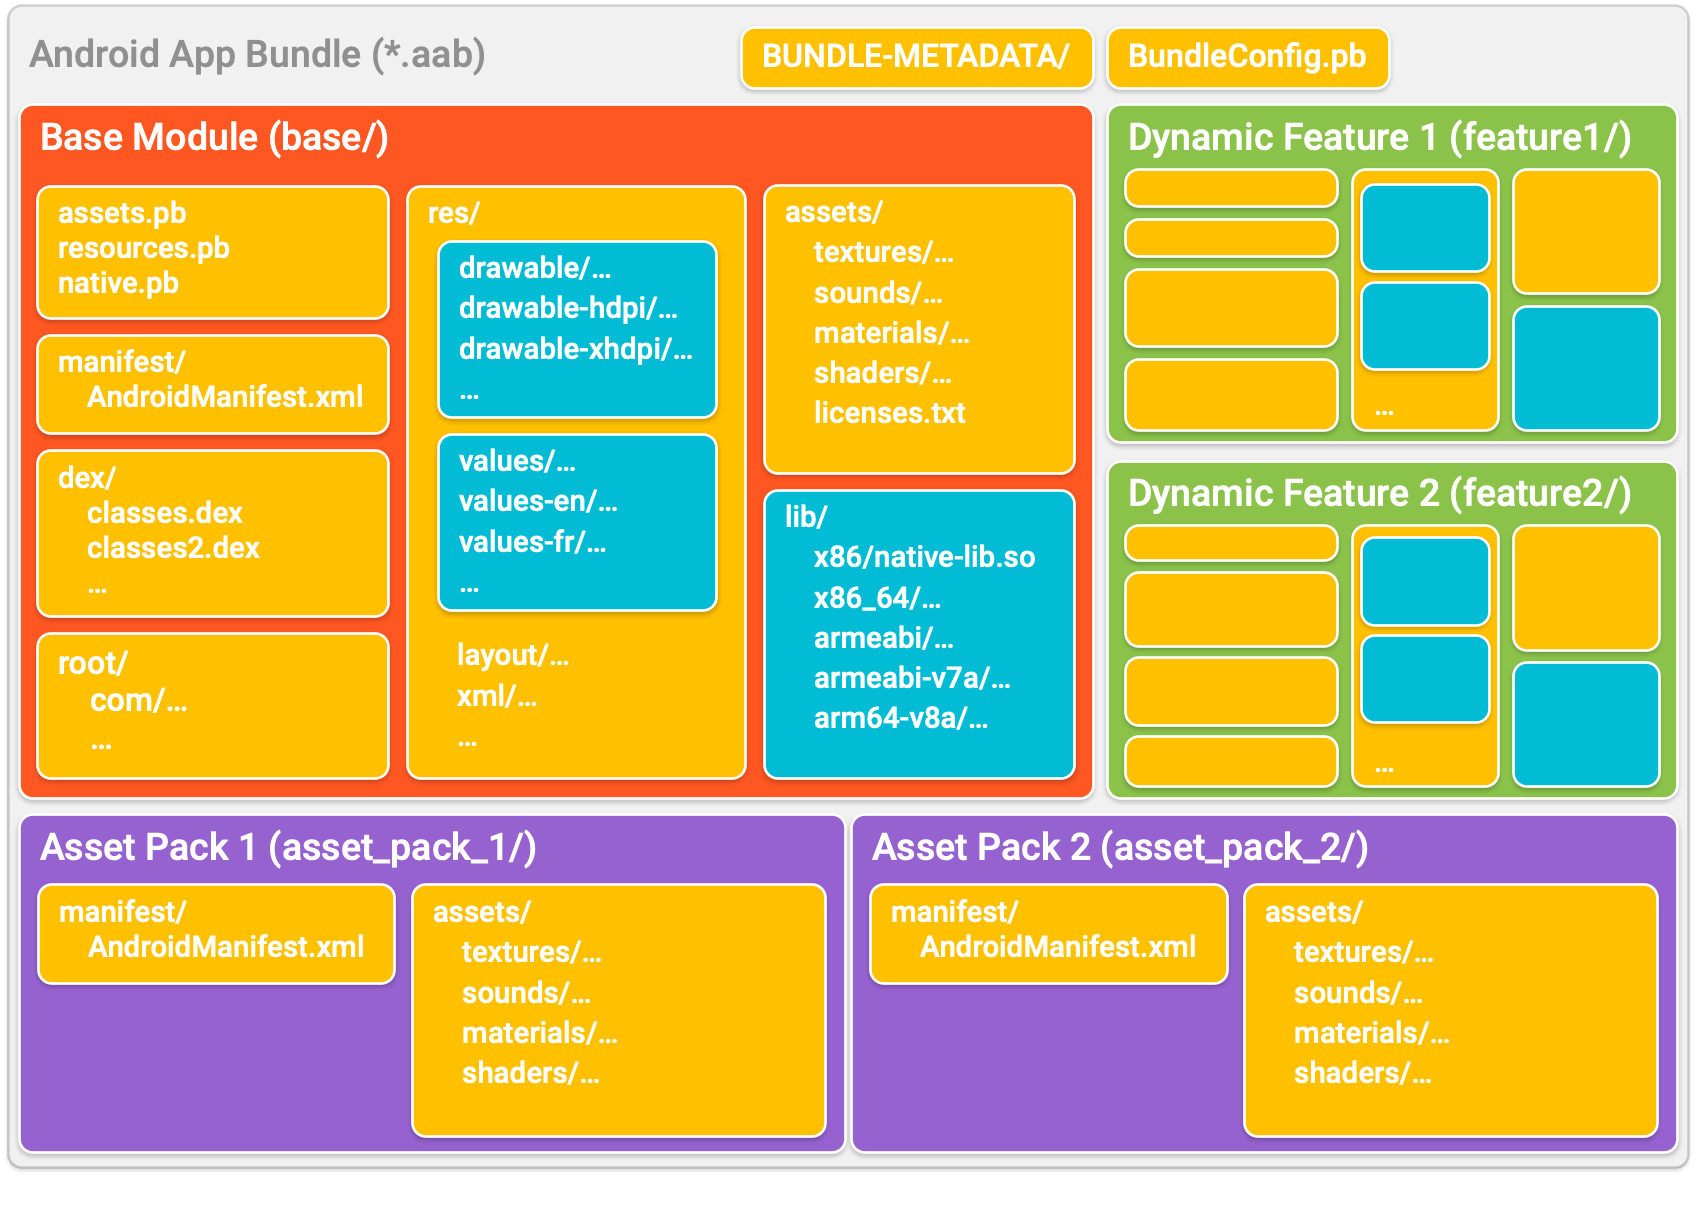 App Bundle은 앱을 디렉터리로 구성하는데, 각 디렉터리는 모듈을 나타냅니다. 각 모듈 디렉터리 내에서 코드와 리소스는 일반 APK의 코드와 리소스와 유사한 형태로 구성됩니다.